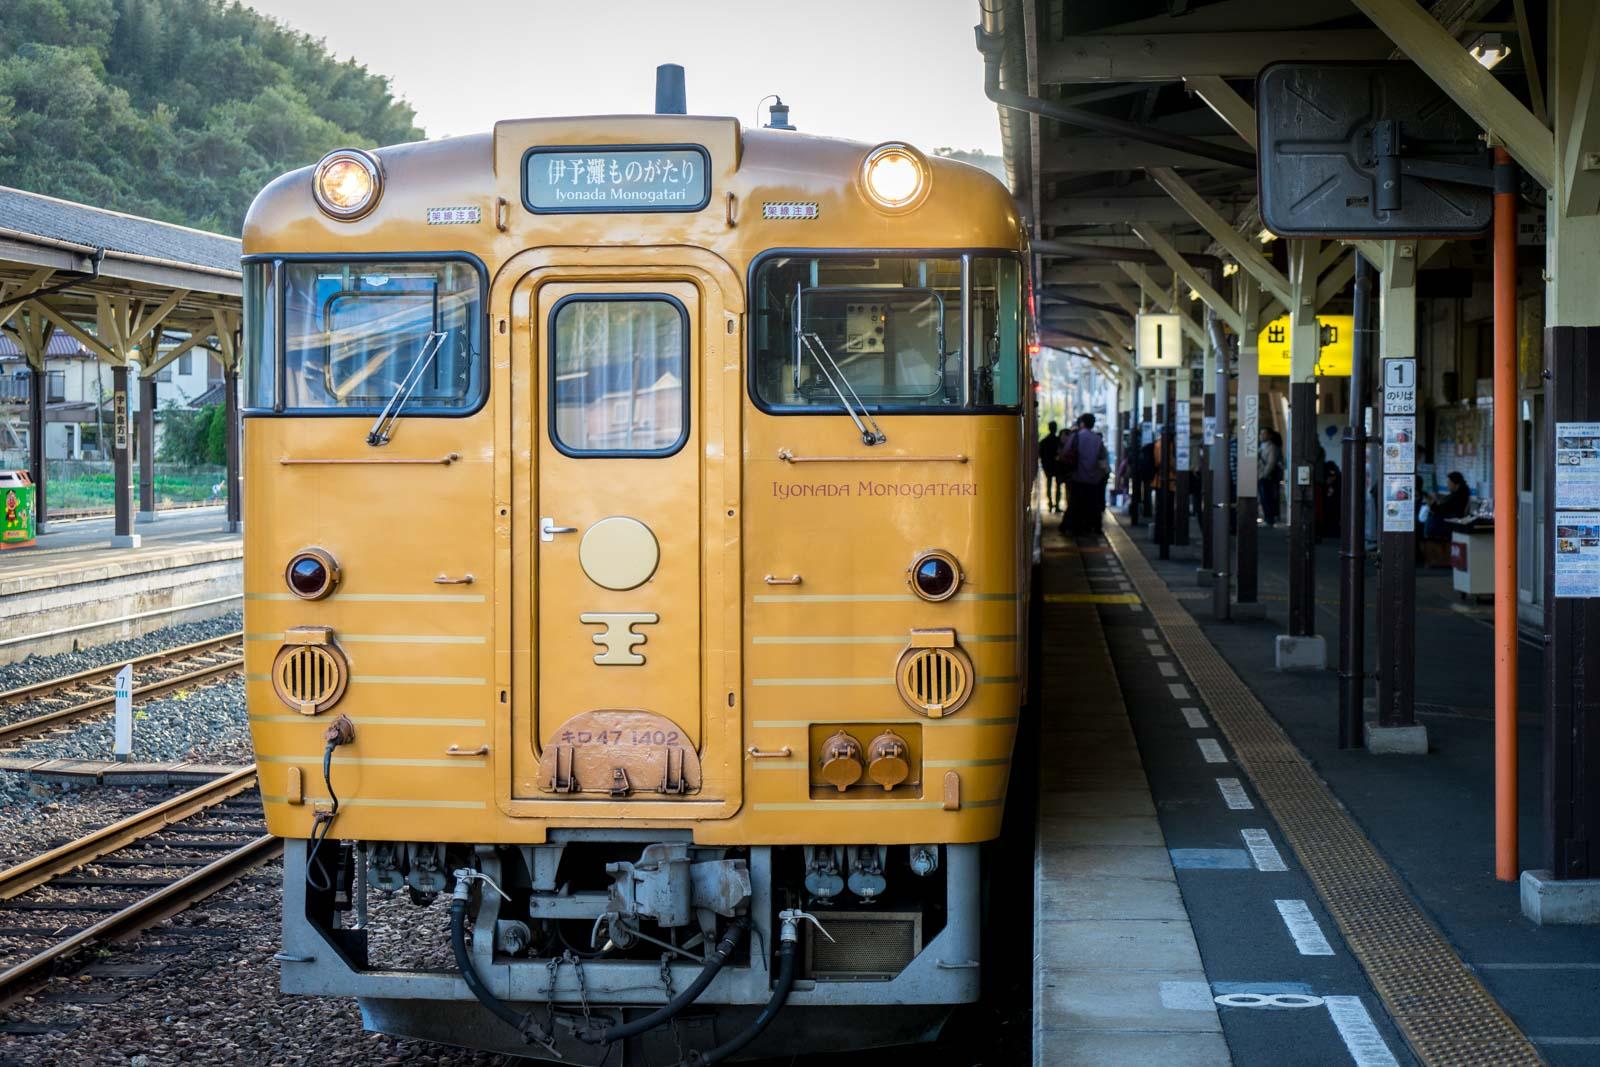 Iyonada Monogatari Train, Ehime, Japan